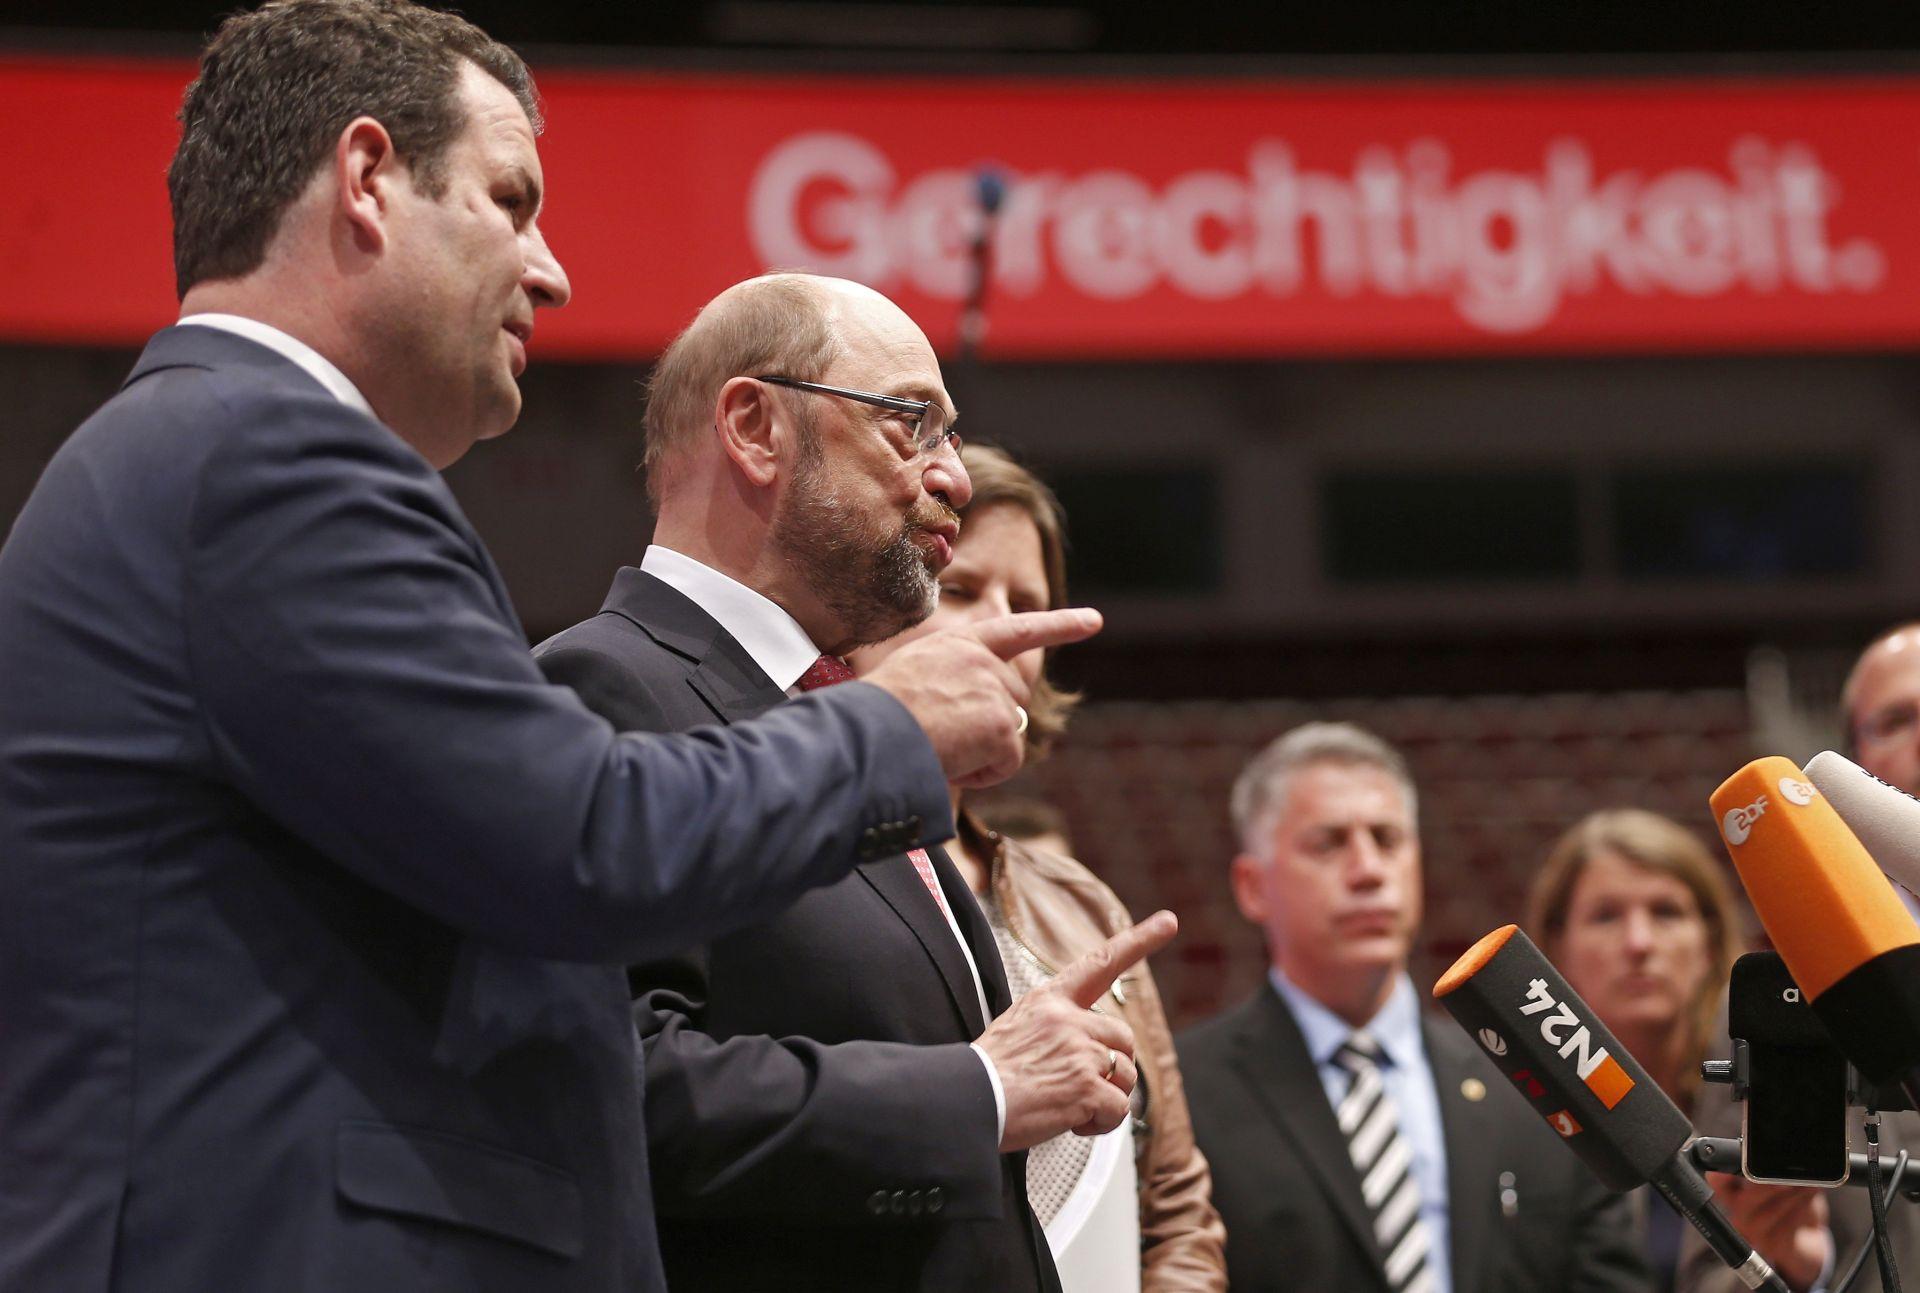 Schulz na kongresu SPD-a kritizirao Merkel